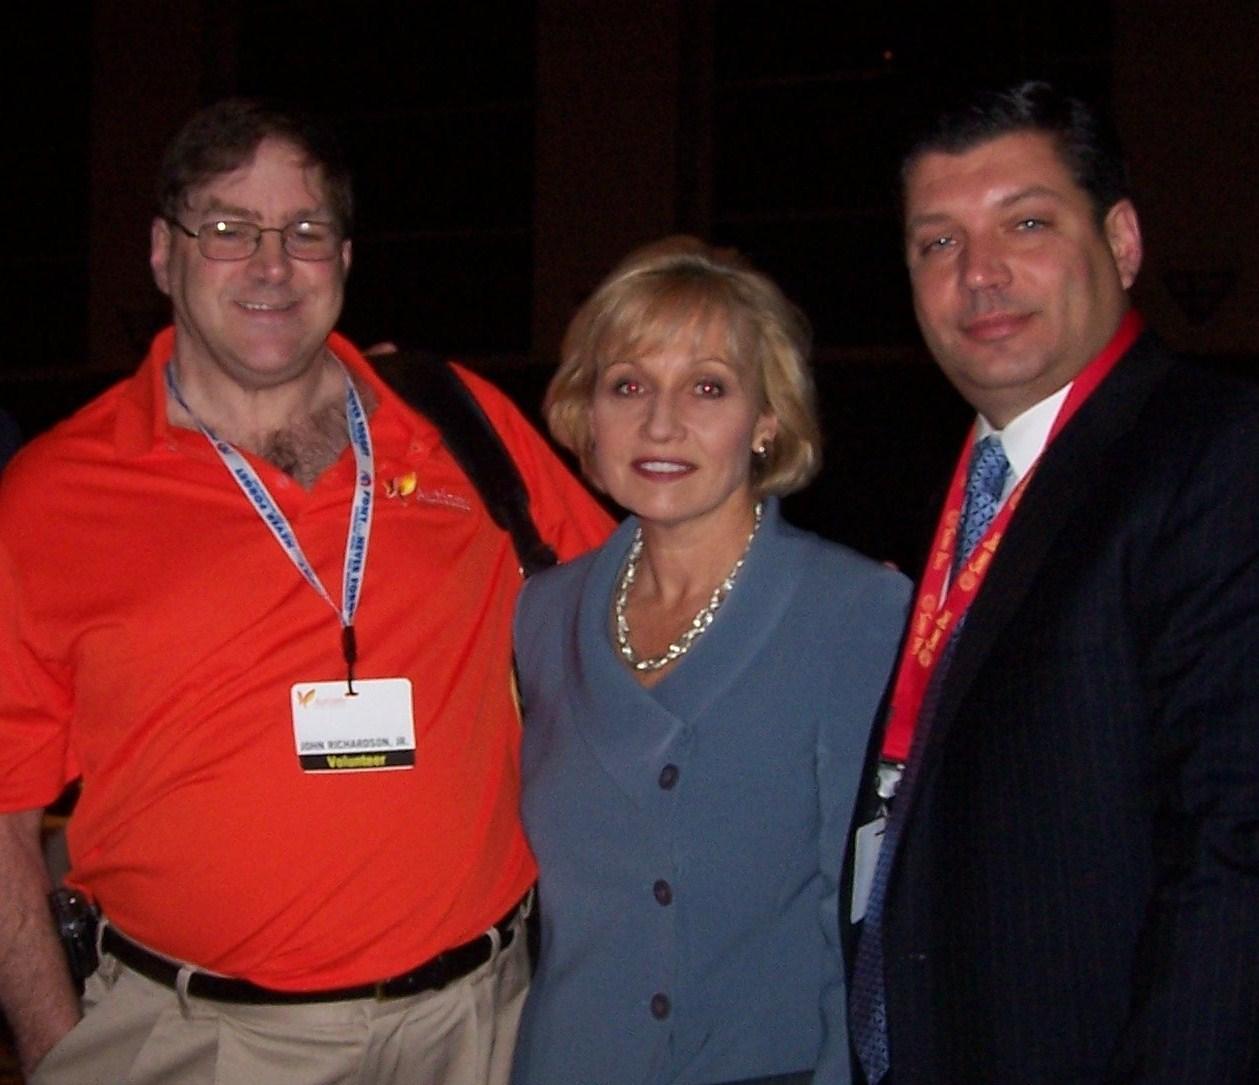 Autism NJ Self Advocate Advisory Board Member John Richardson, Lieutenant Governor Kim Guadagno, Autism NJ Board of Trustees President Jim Paone and Autism NJ Executive Director Dr. Linda Meyer.